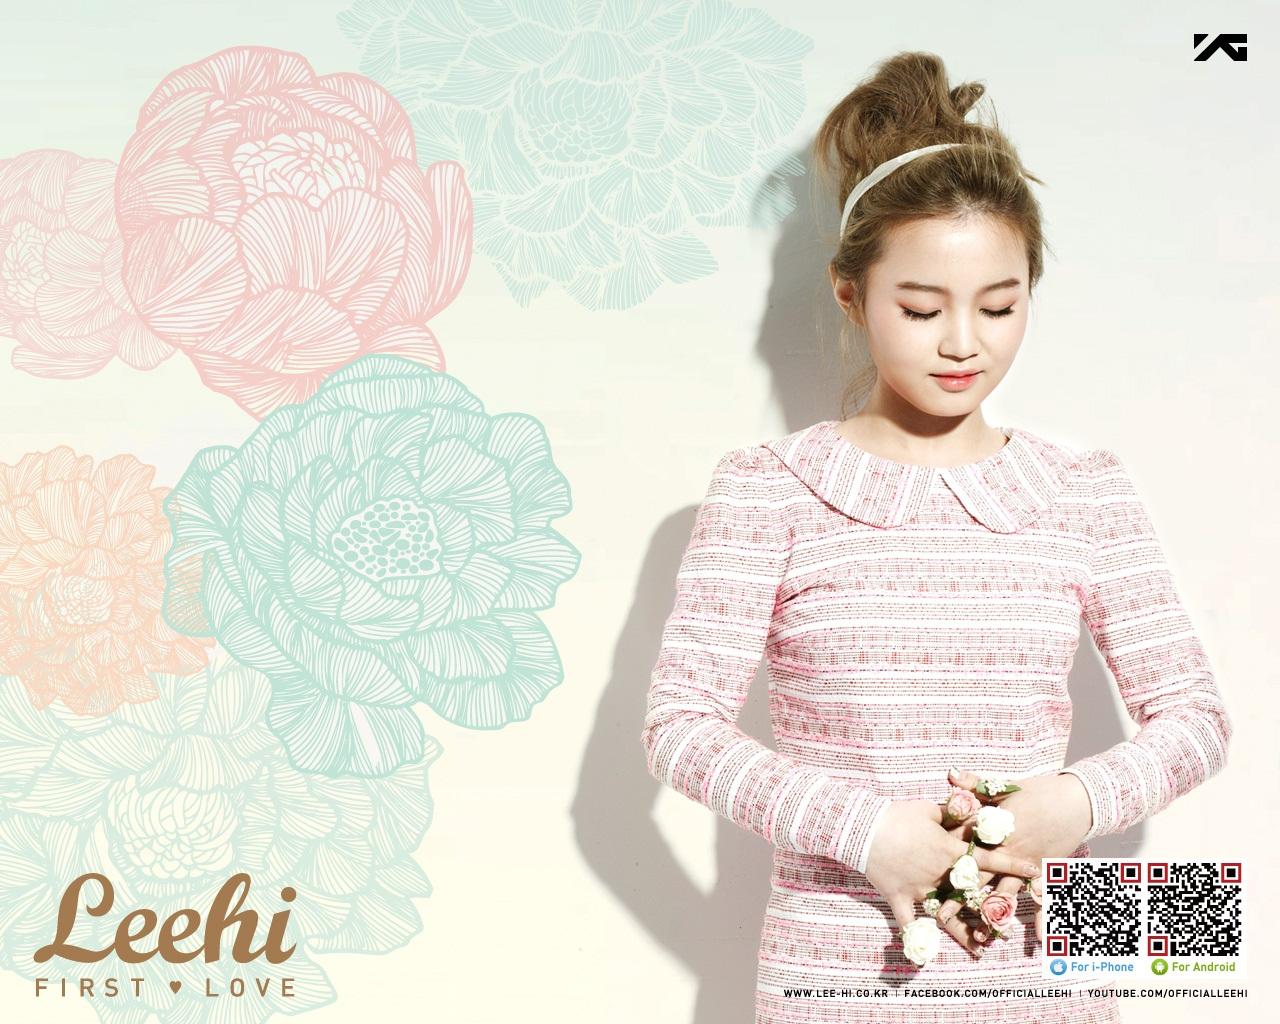 http://2.bp.blogspot.com/-j5UrTlwcdZU/UVkjxKYZjxI/AAAAAAAAh3w/5DWtZ49mcNE/s1600/Lee+Hi+First+Love+Wallpaper+7.jpg